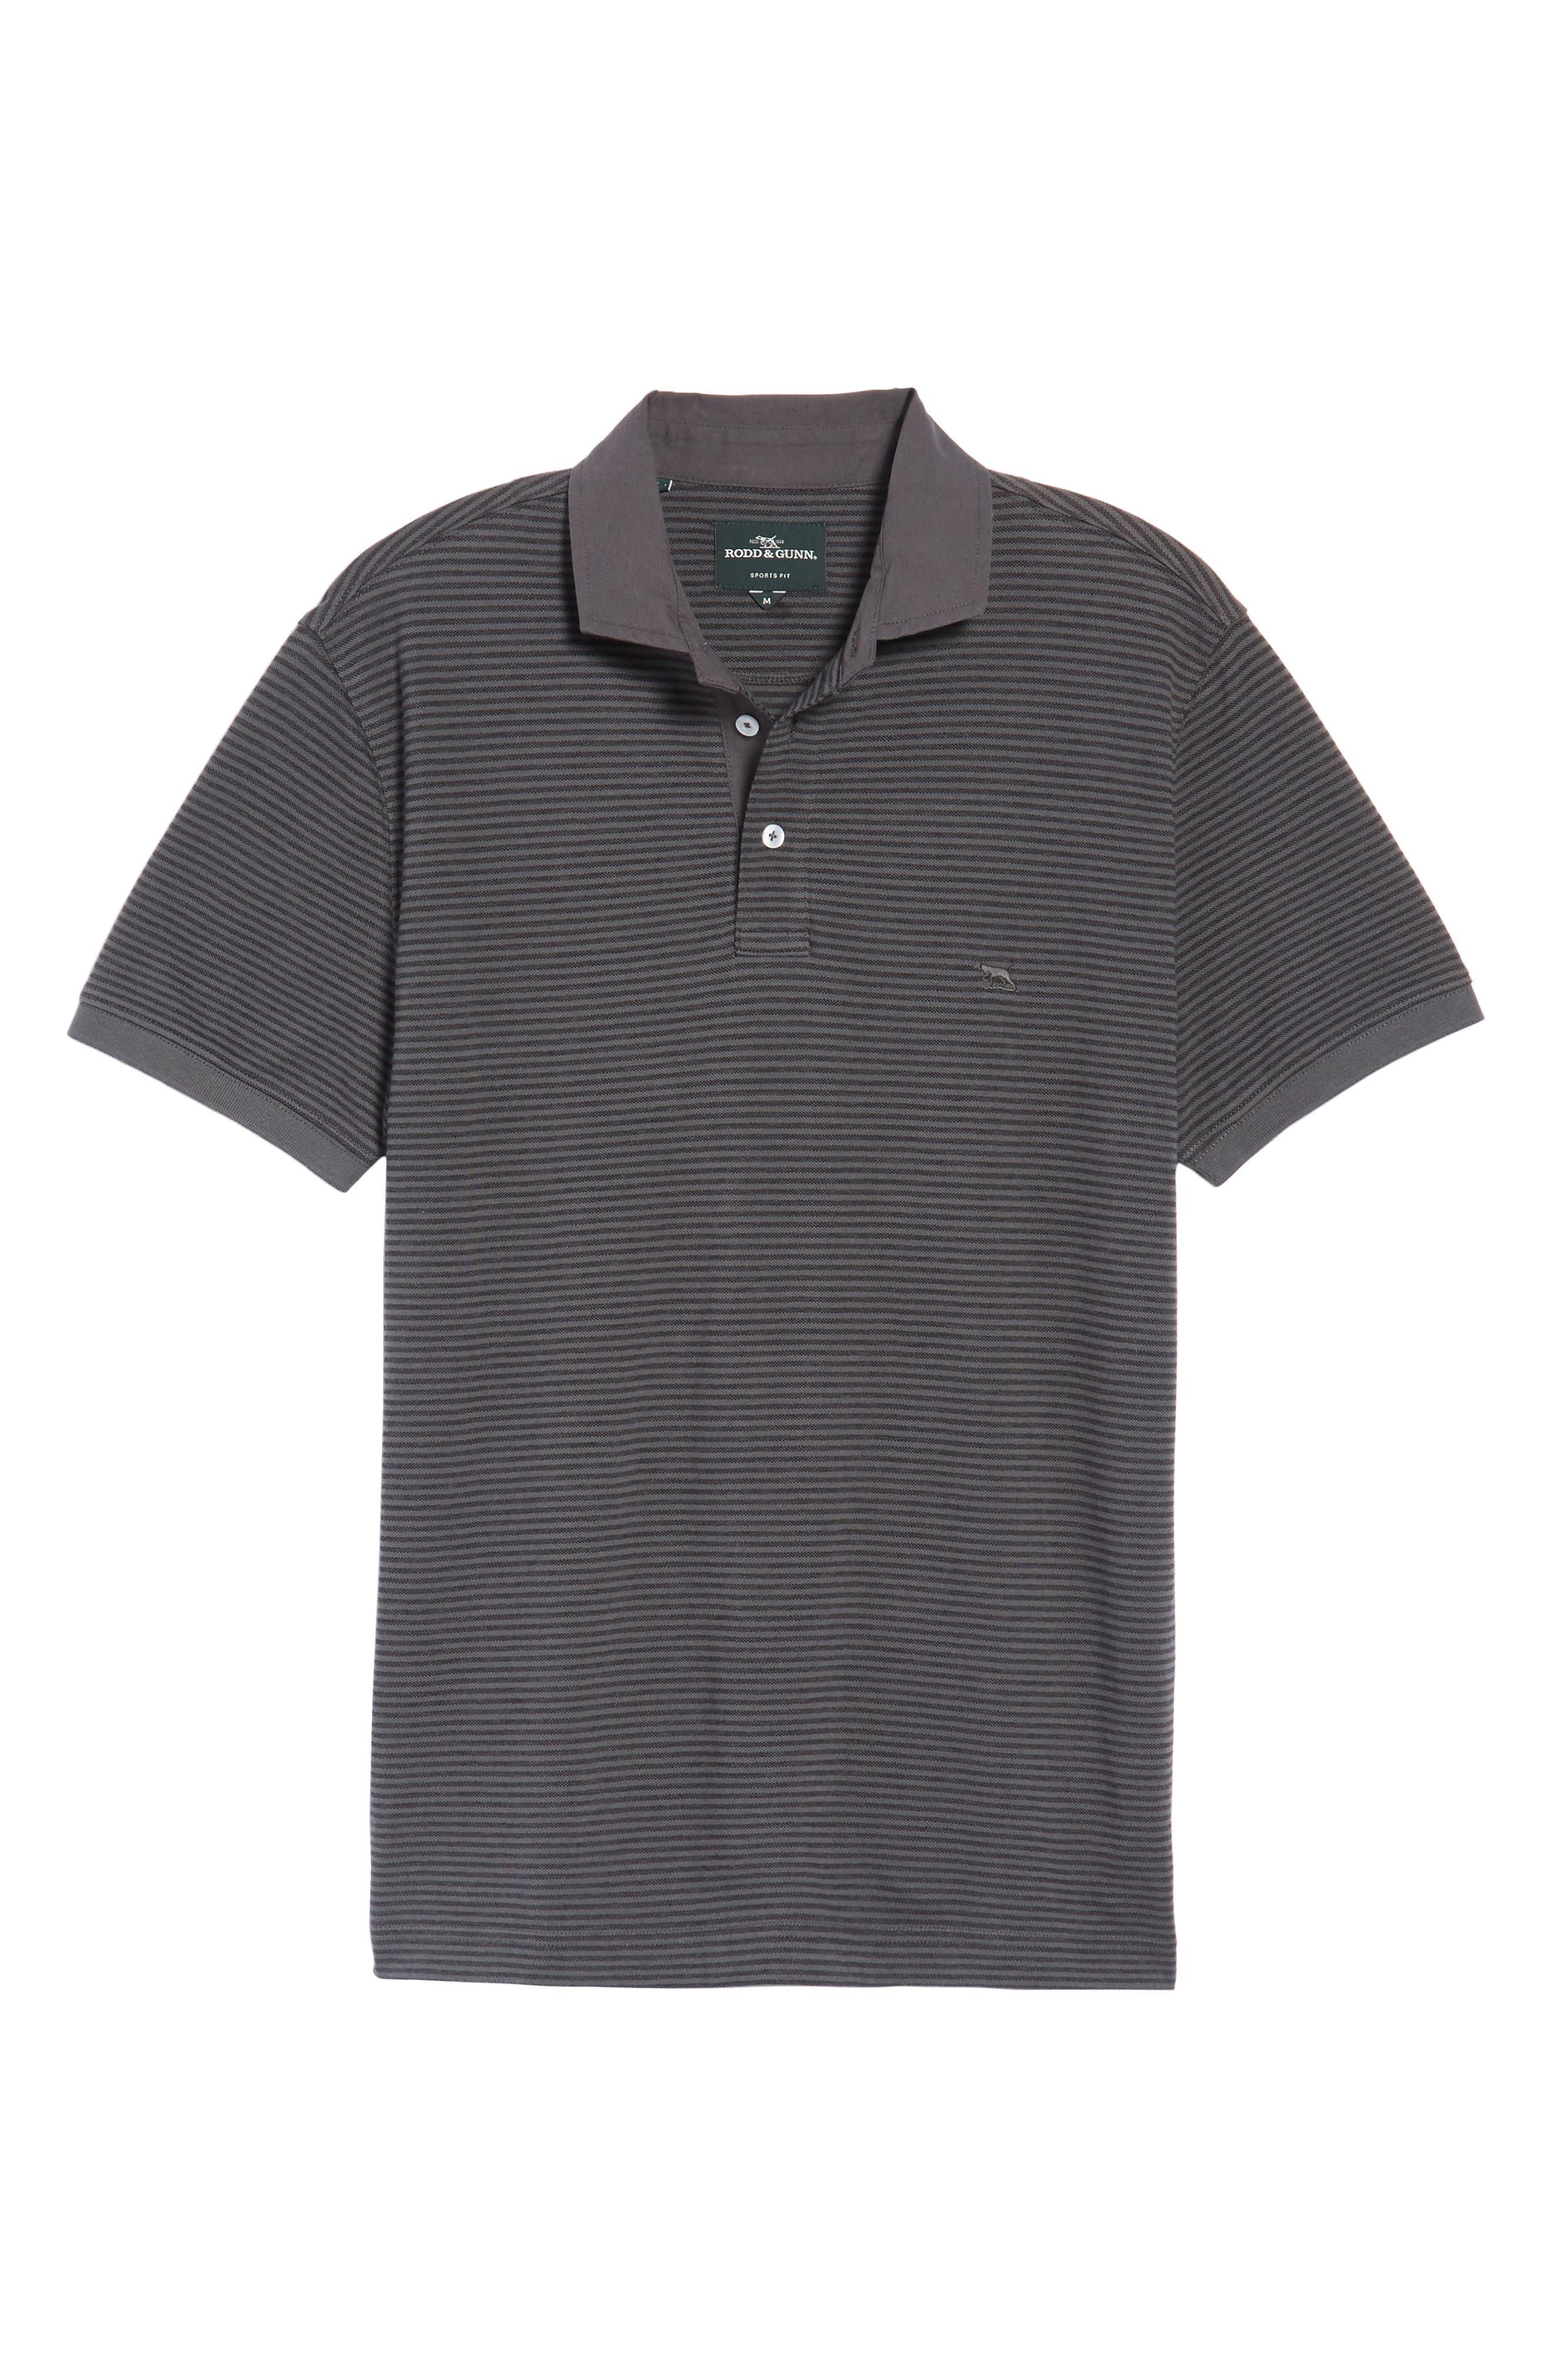 Lendenfield Sports Fit Stripe Piqué Polo,                             Alternate thumbnail 6, color,                             023